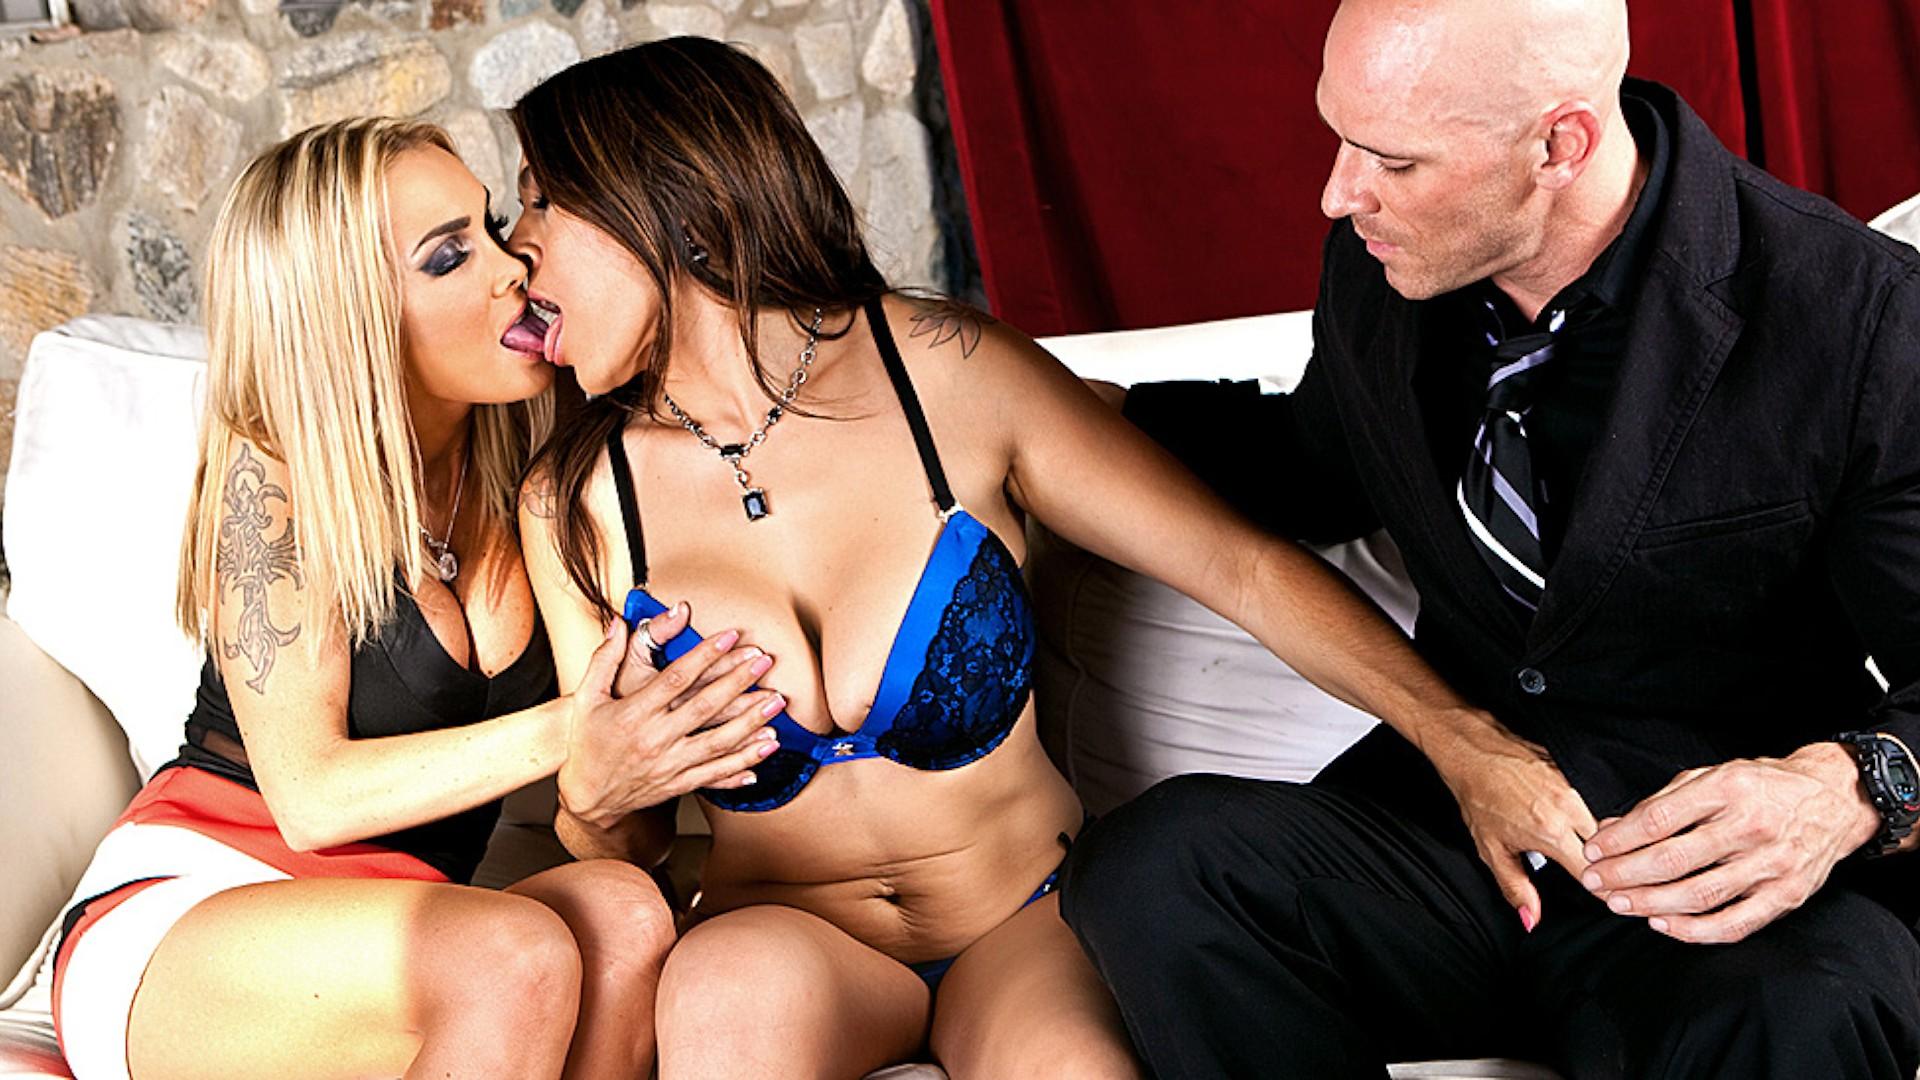 Til Dick do us Part Episode 4 - Real Wife Stories